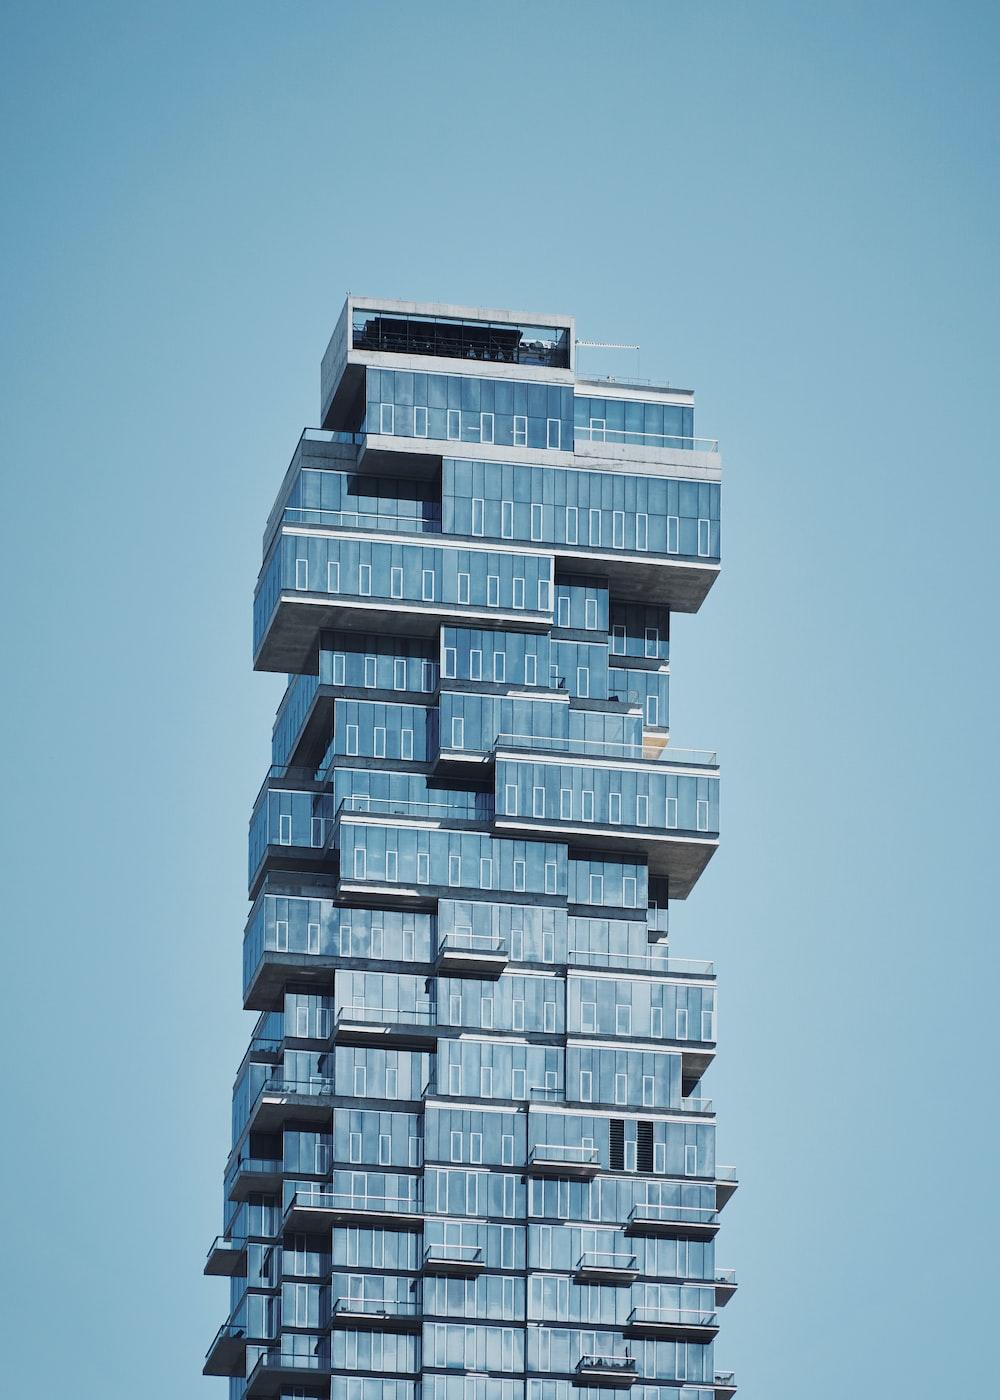 blue high-rise building under a calm blue sky